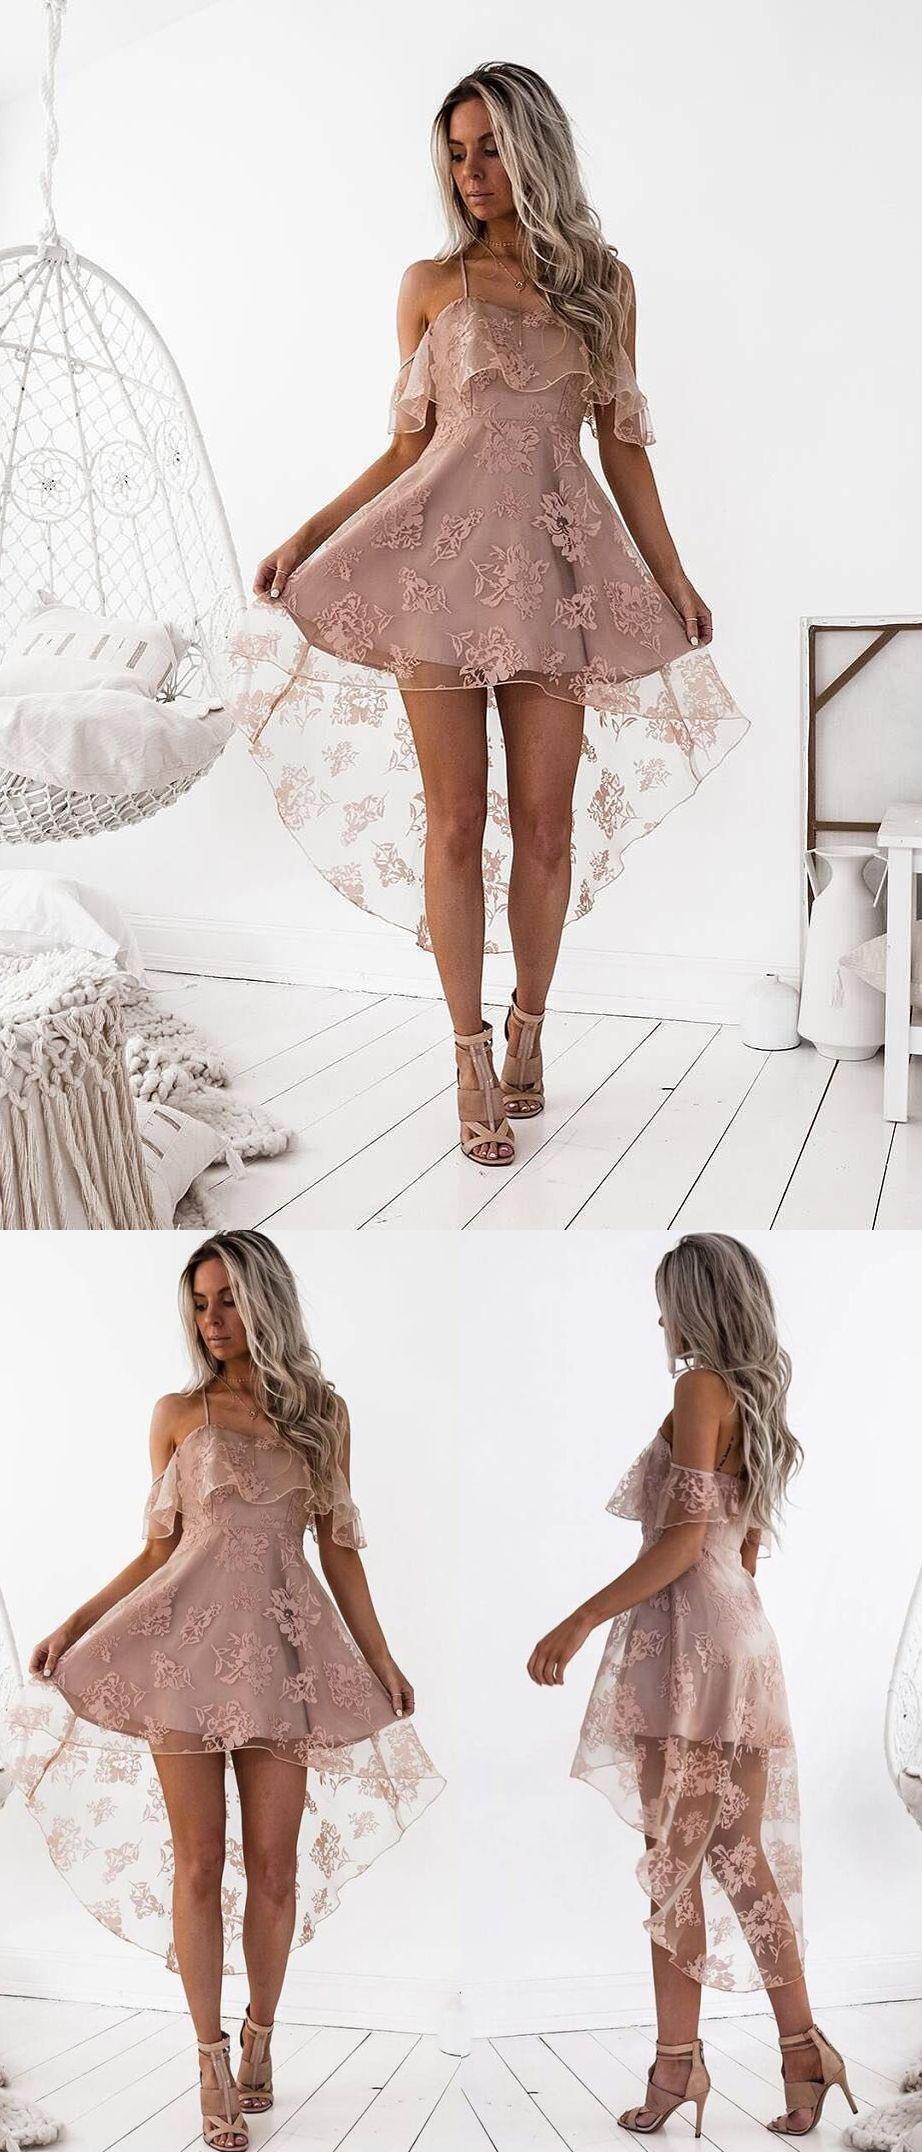 ca07b65ba32 High Low Homecoming Dress Spaghetti Straps Asymmetrical Lace Sexy Short  Prom Dress Party Dress JK457 homecomingdress  homecoming  shortdress   shortpromdress ...